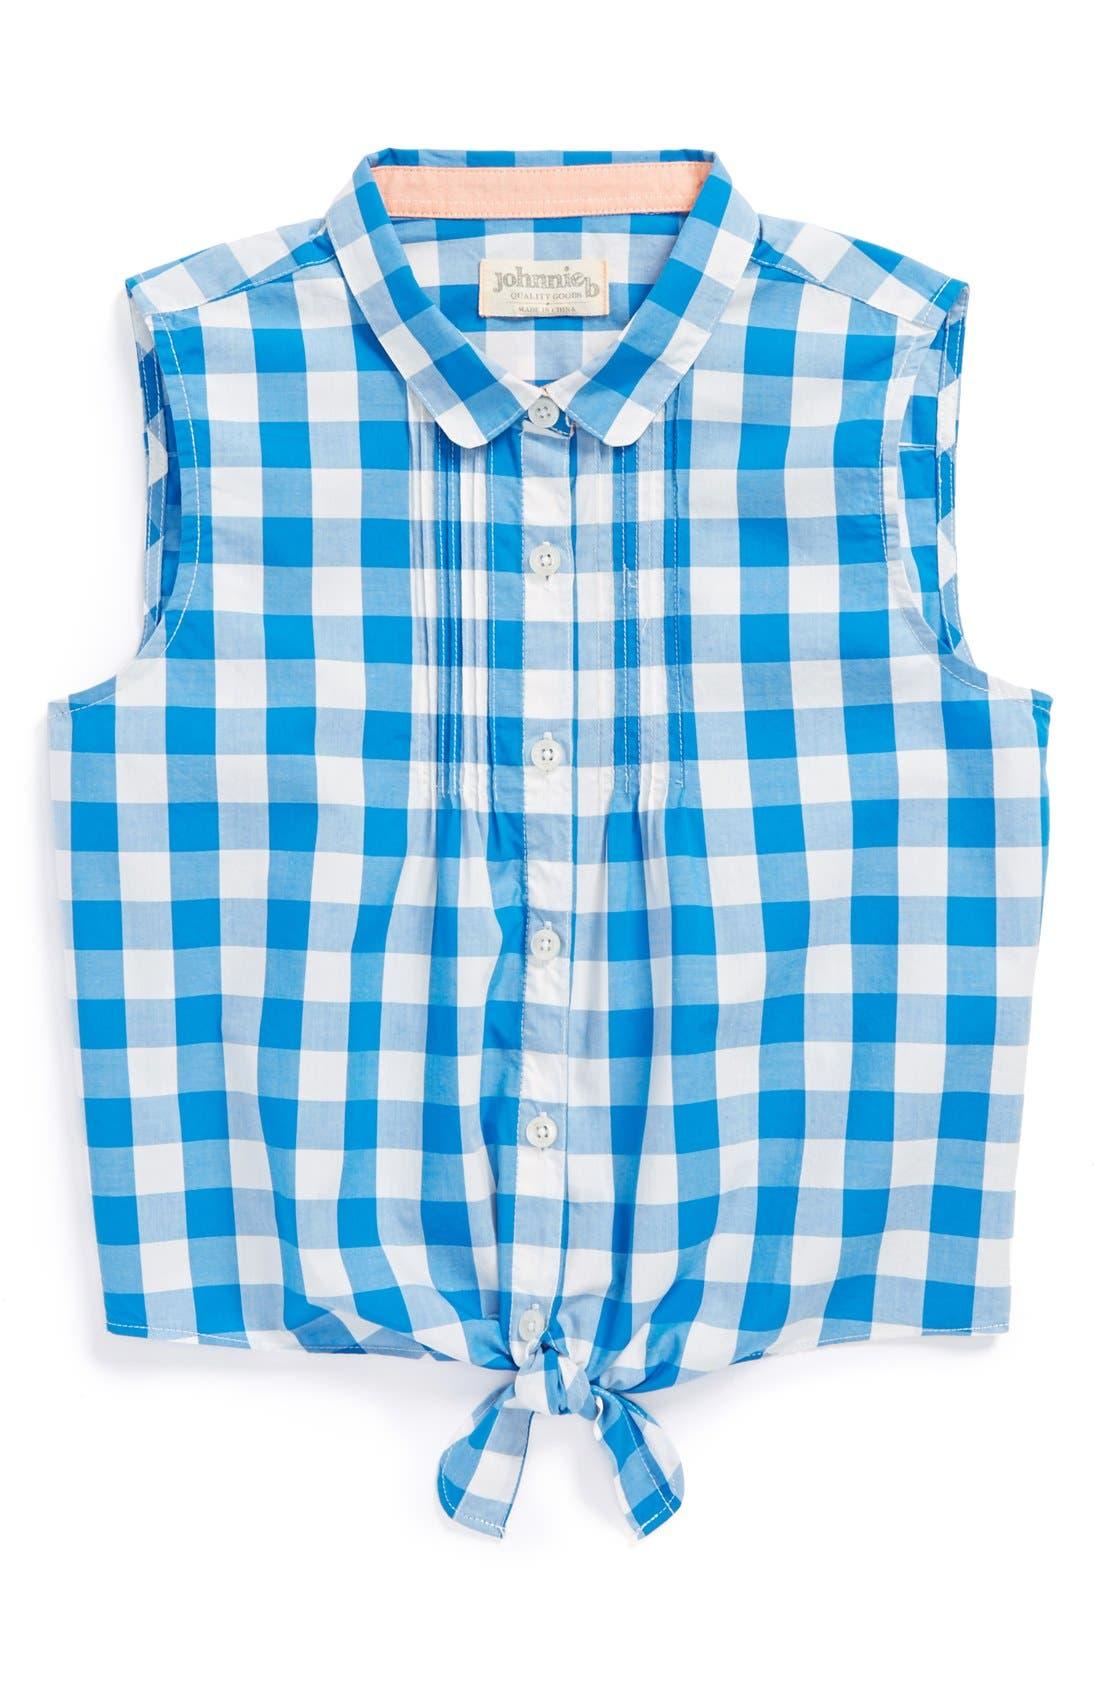 Main Image - Johnnie B by Boden 'Tie Front' Sleeveless Shirt (Big Girls)